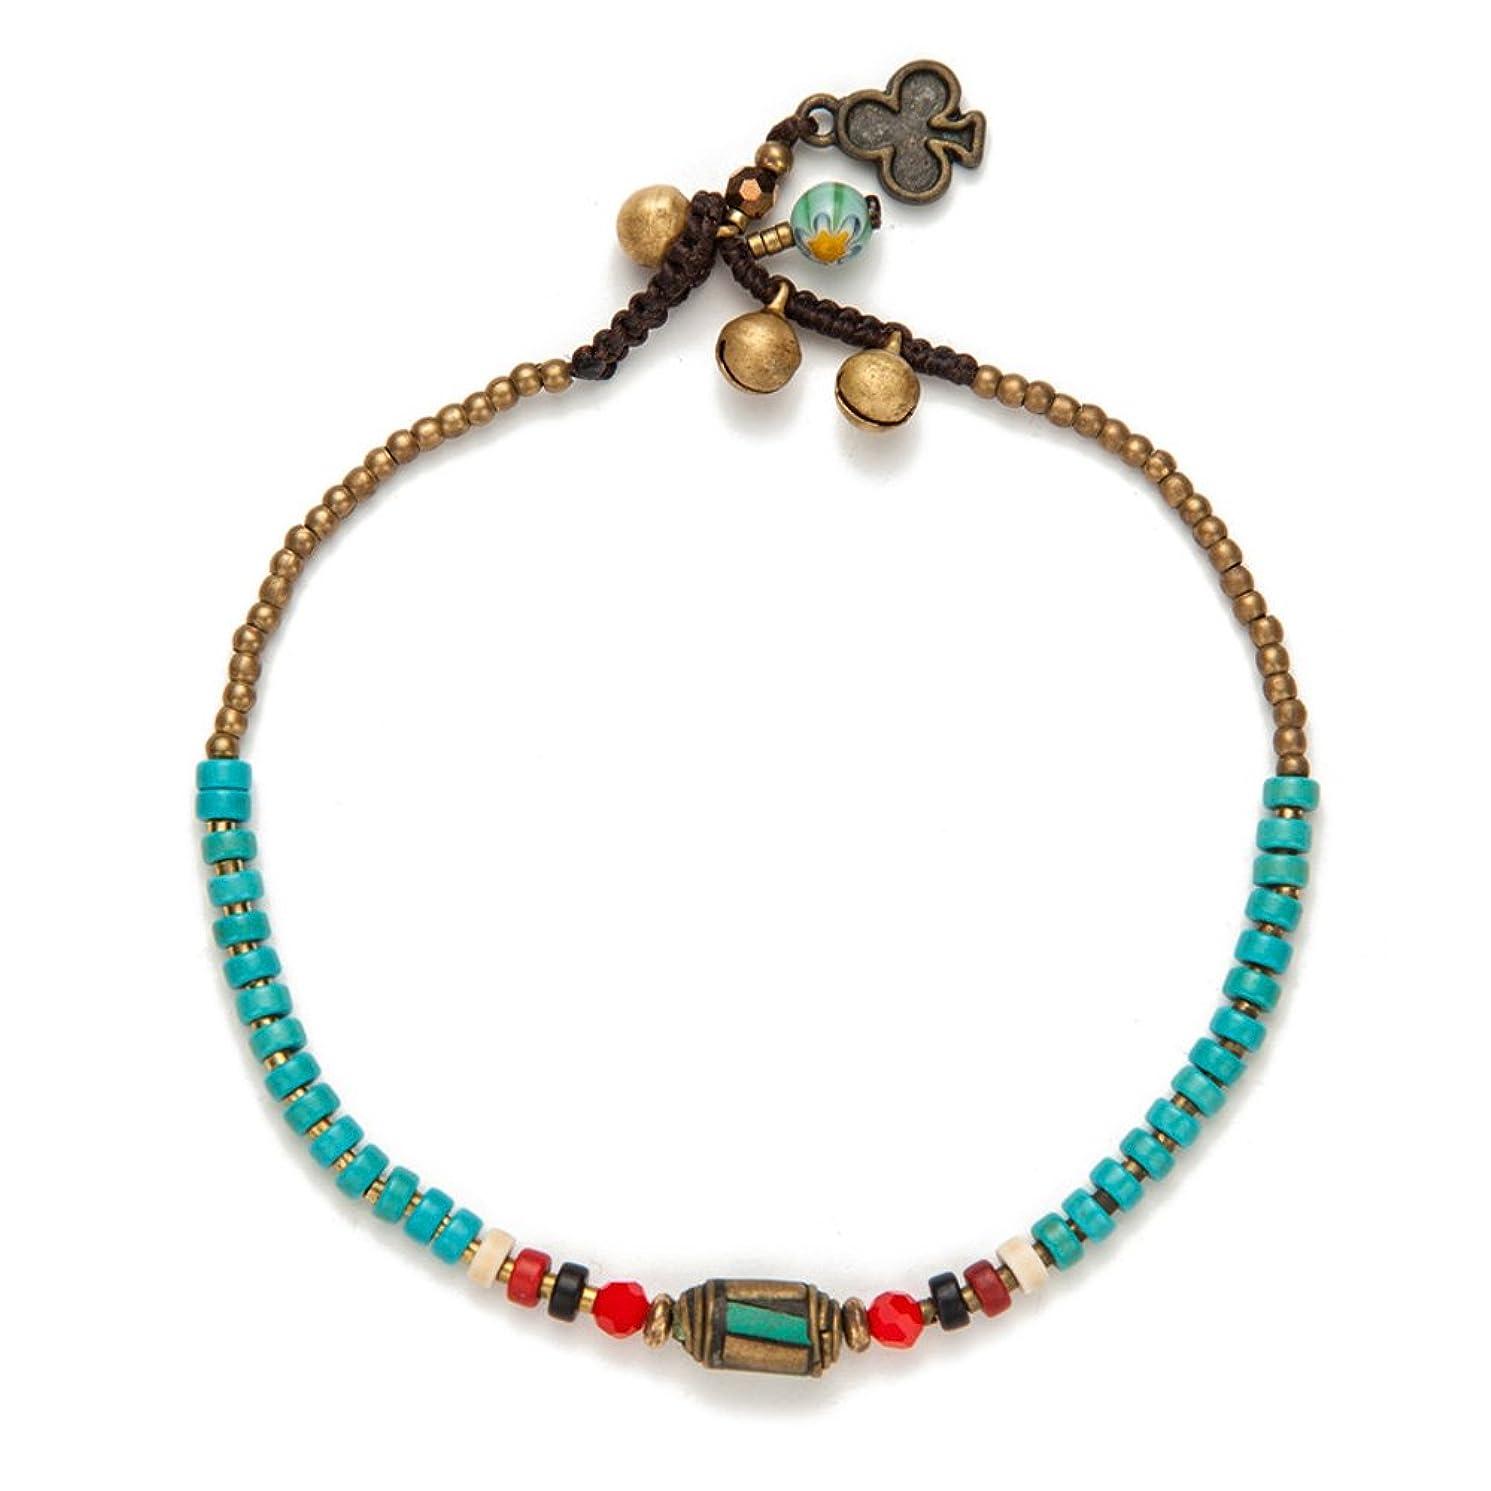 TOMLEE Beaded Rope Anklet Boho Handmade Wax Rope Braided Ankle Bracelet, Nepal Stone Charm Anklets